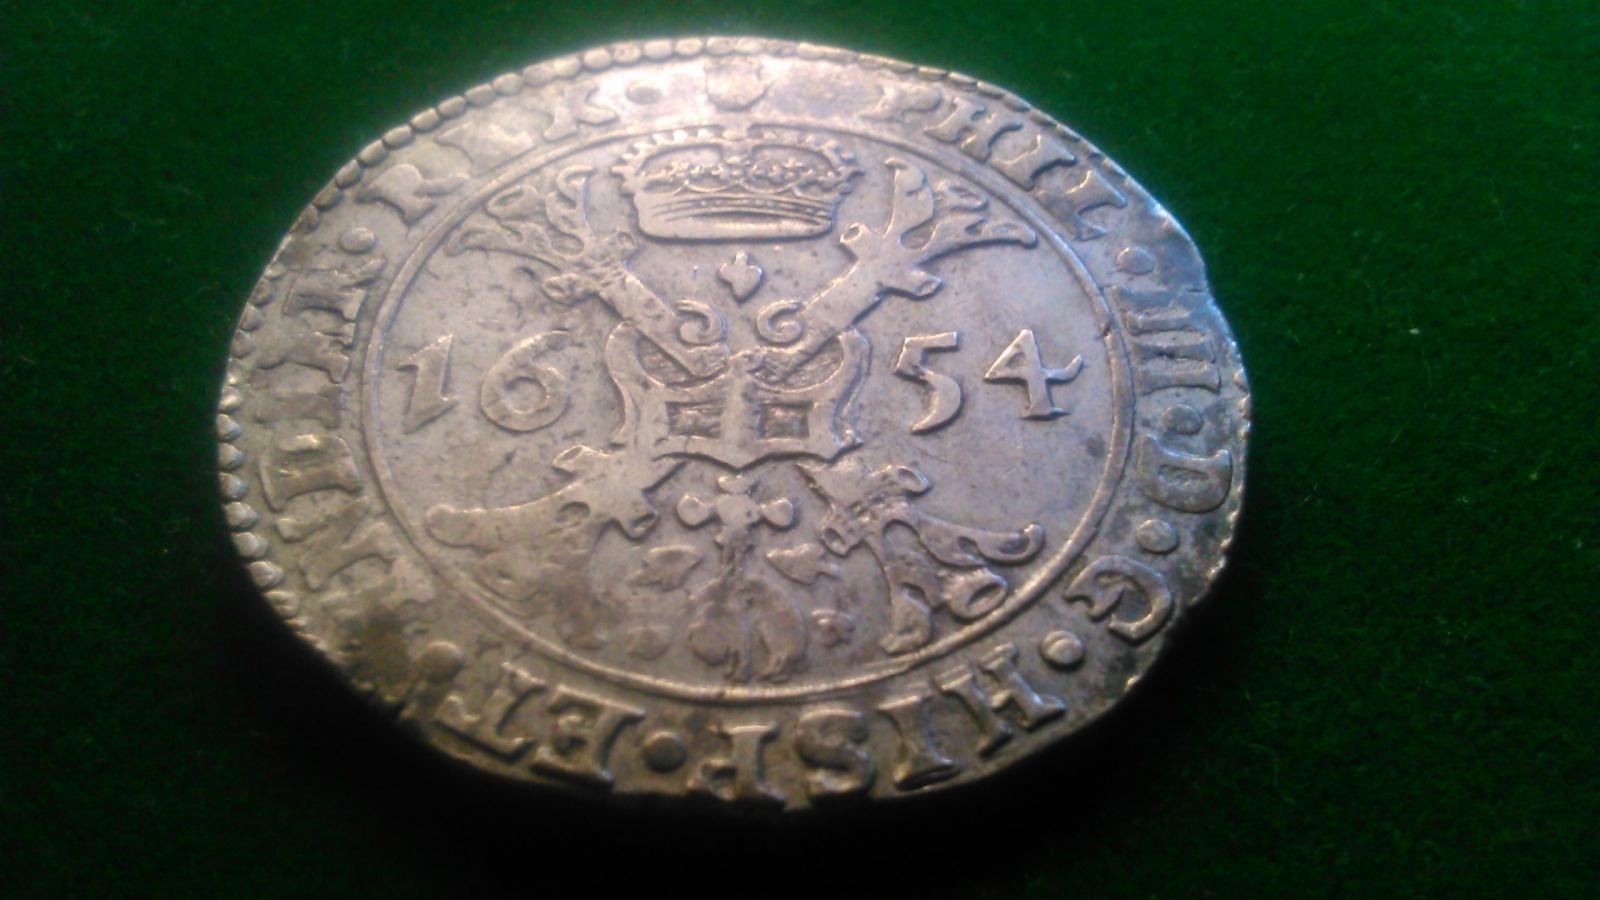 1 Patagón. Felipe IV 1654 Amberes. Dedicada a Lanzarote 30kujxs